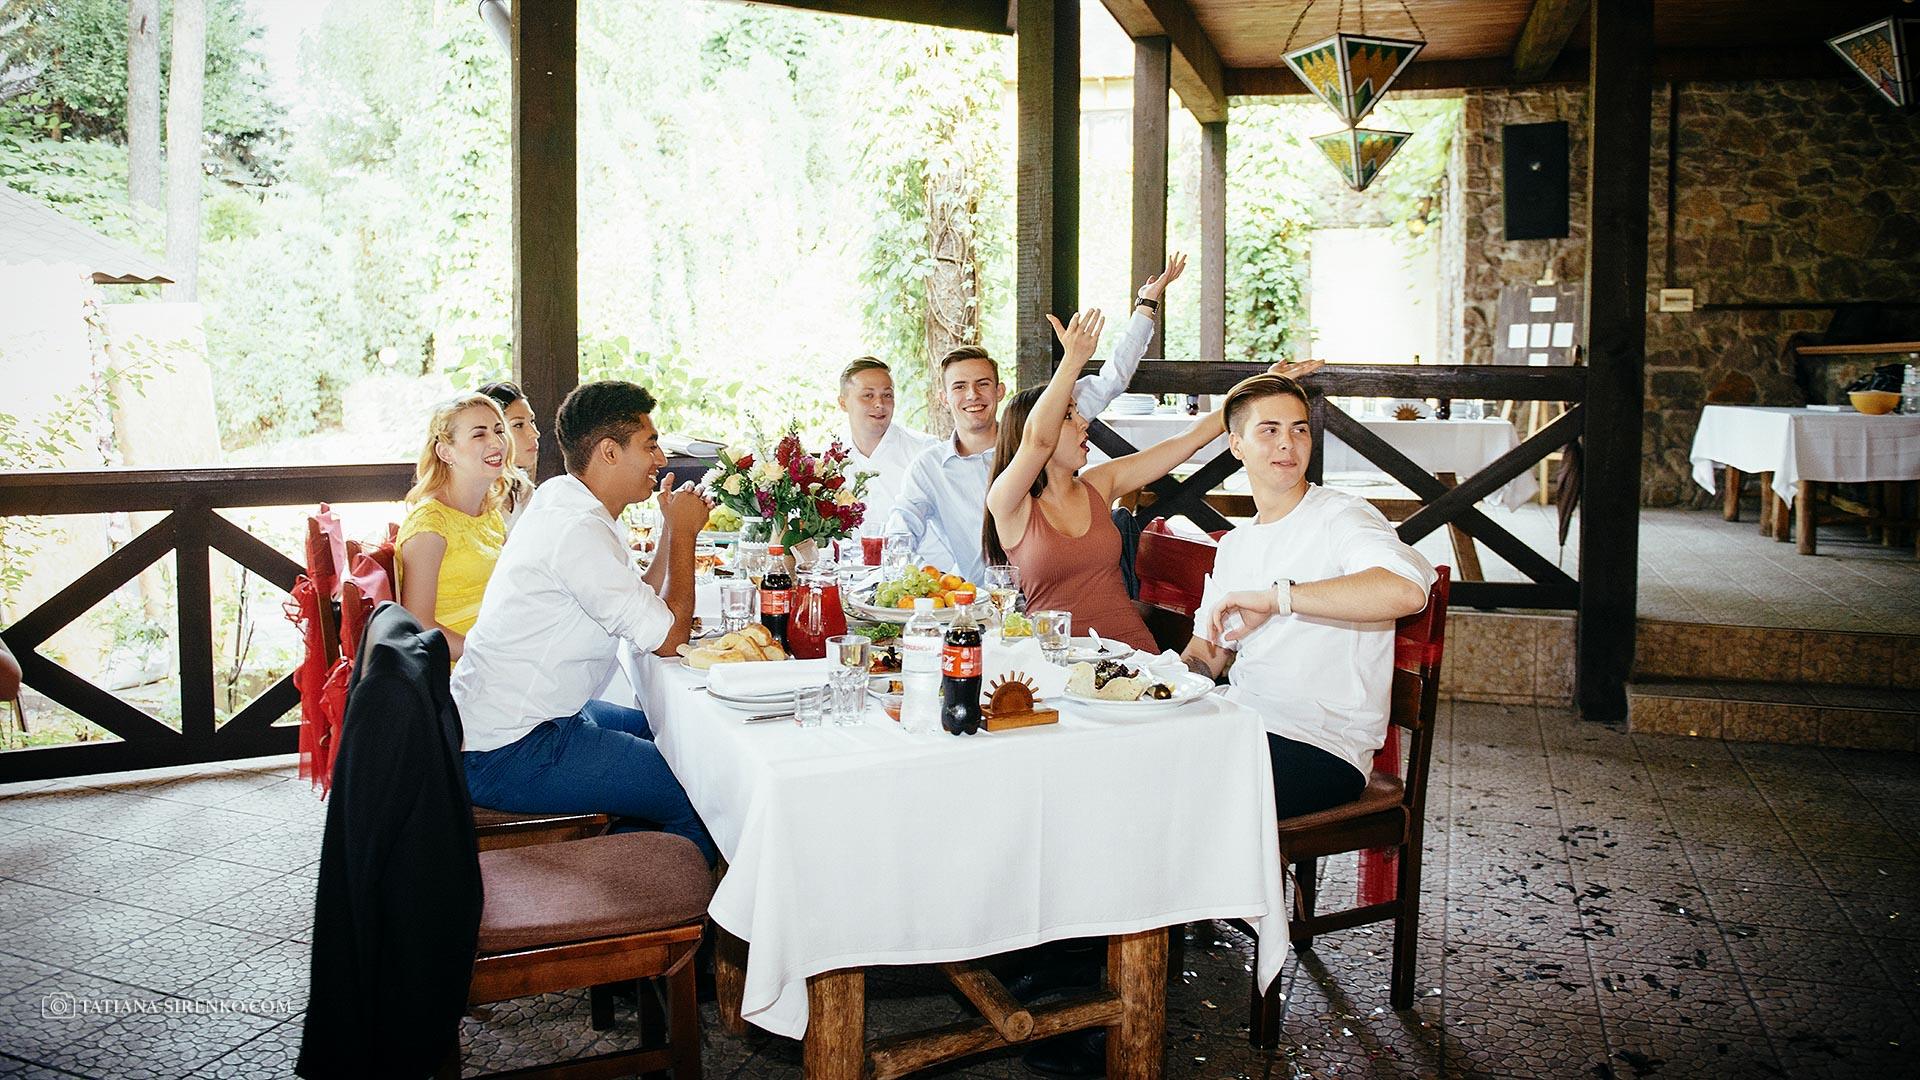 Свадебная фотосъемка в ресторане